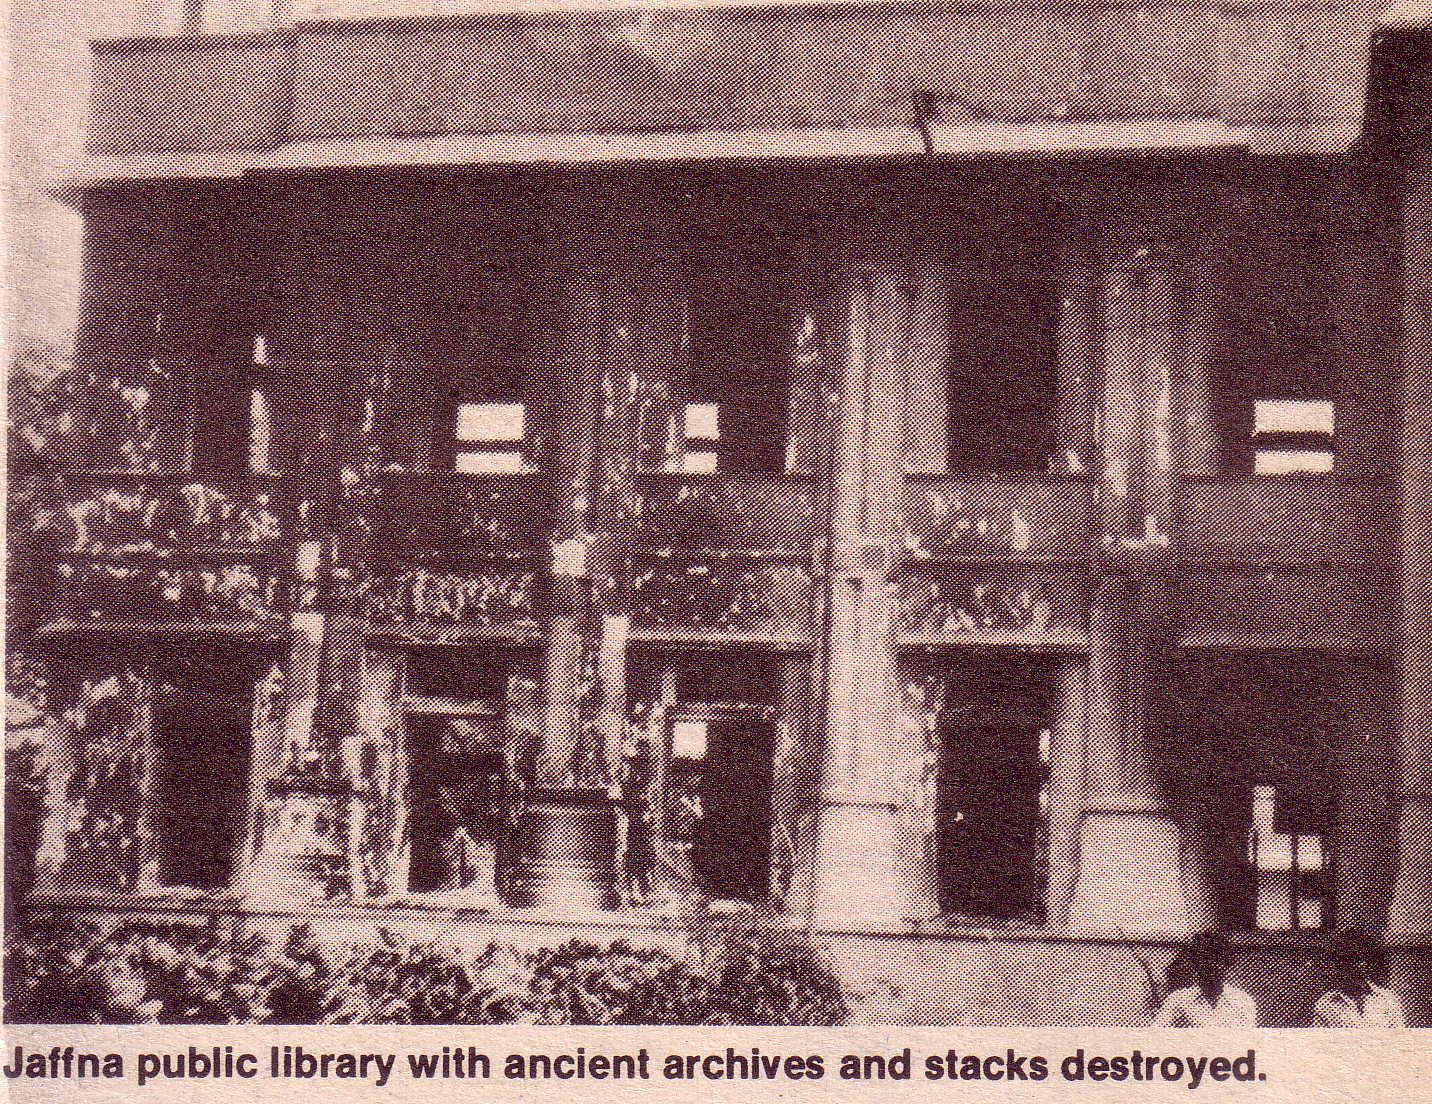 Jaffna-Public-Library-gutted-June-1981.jpg